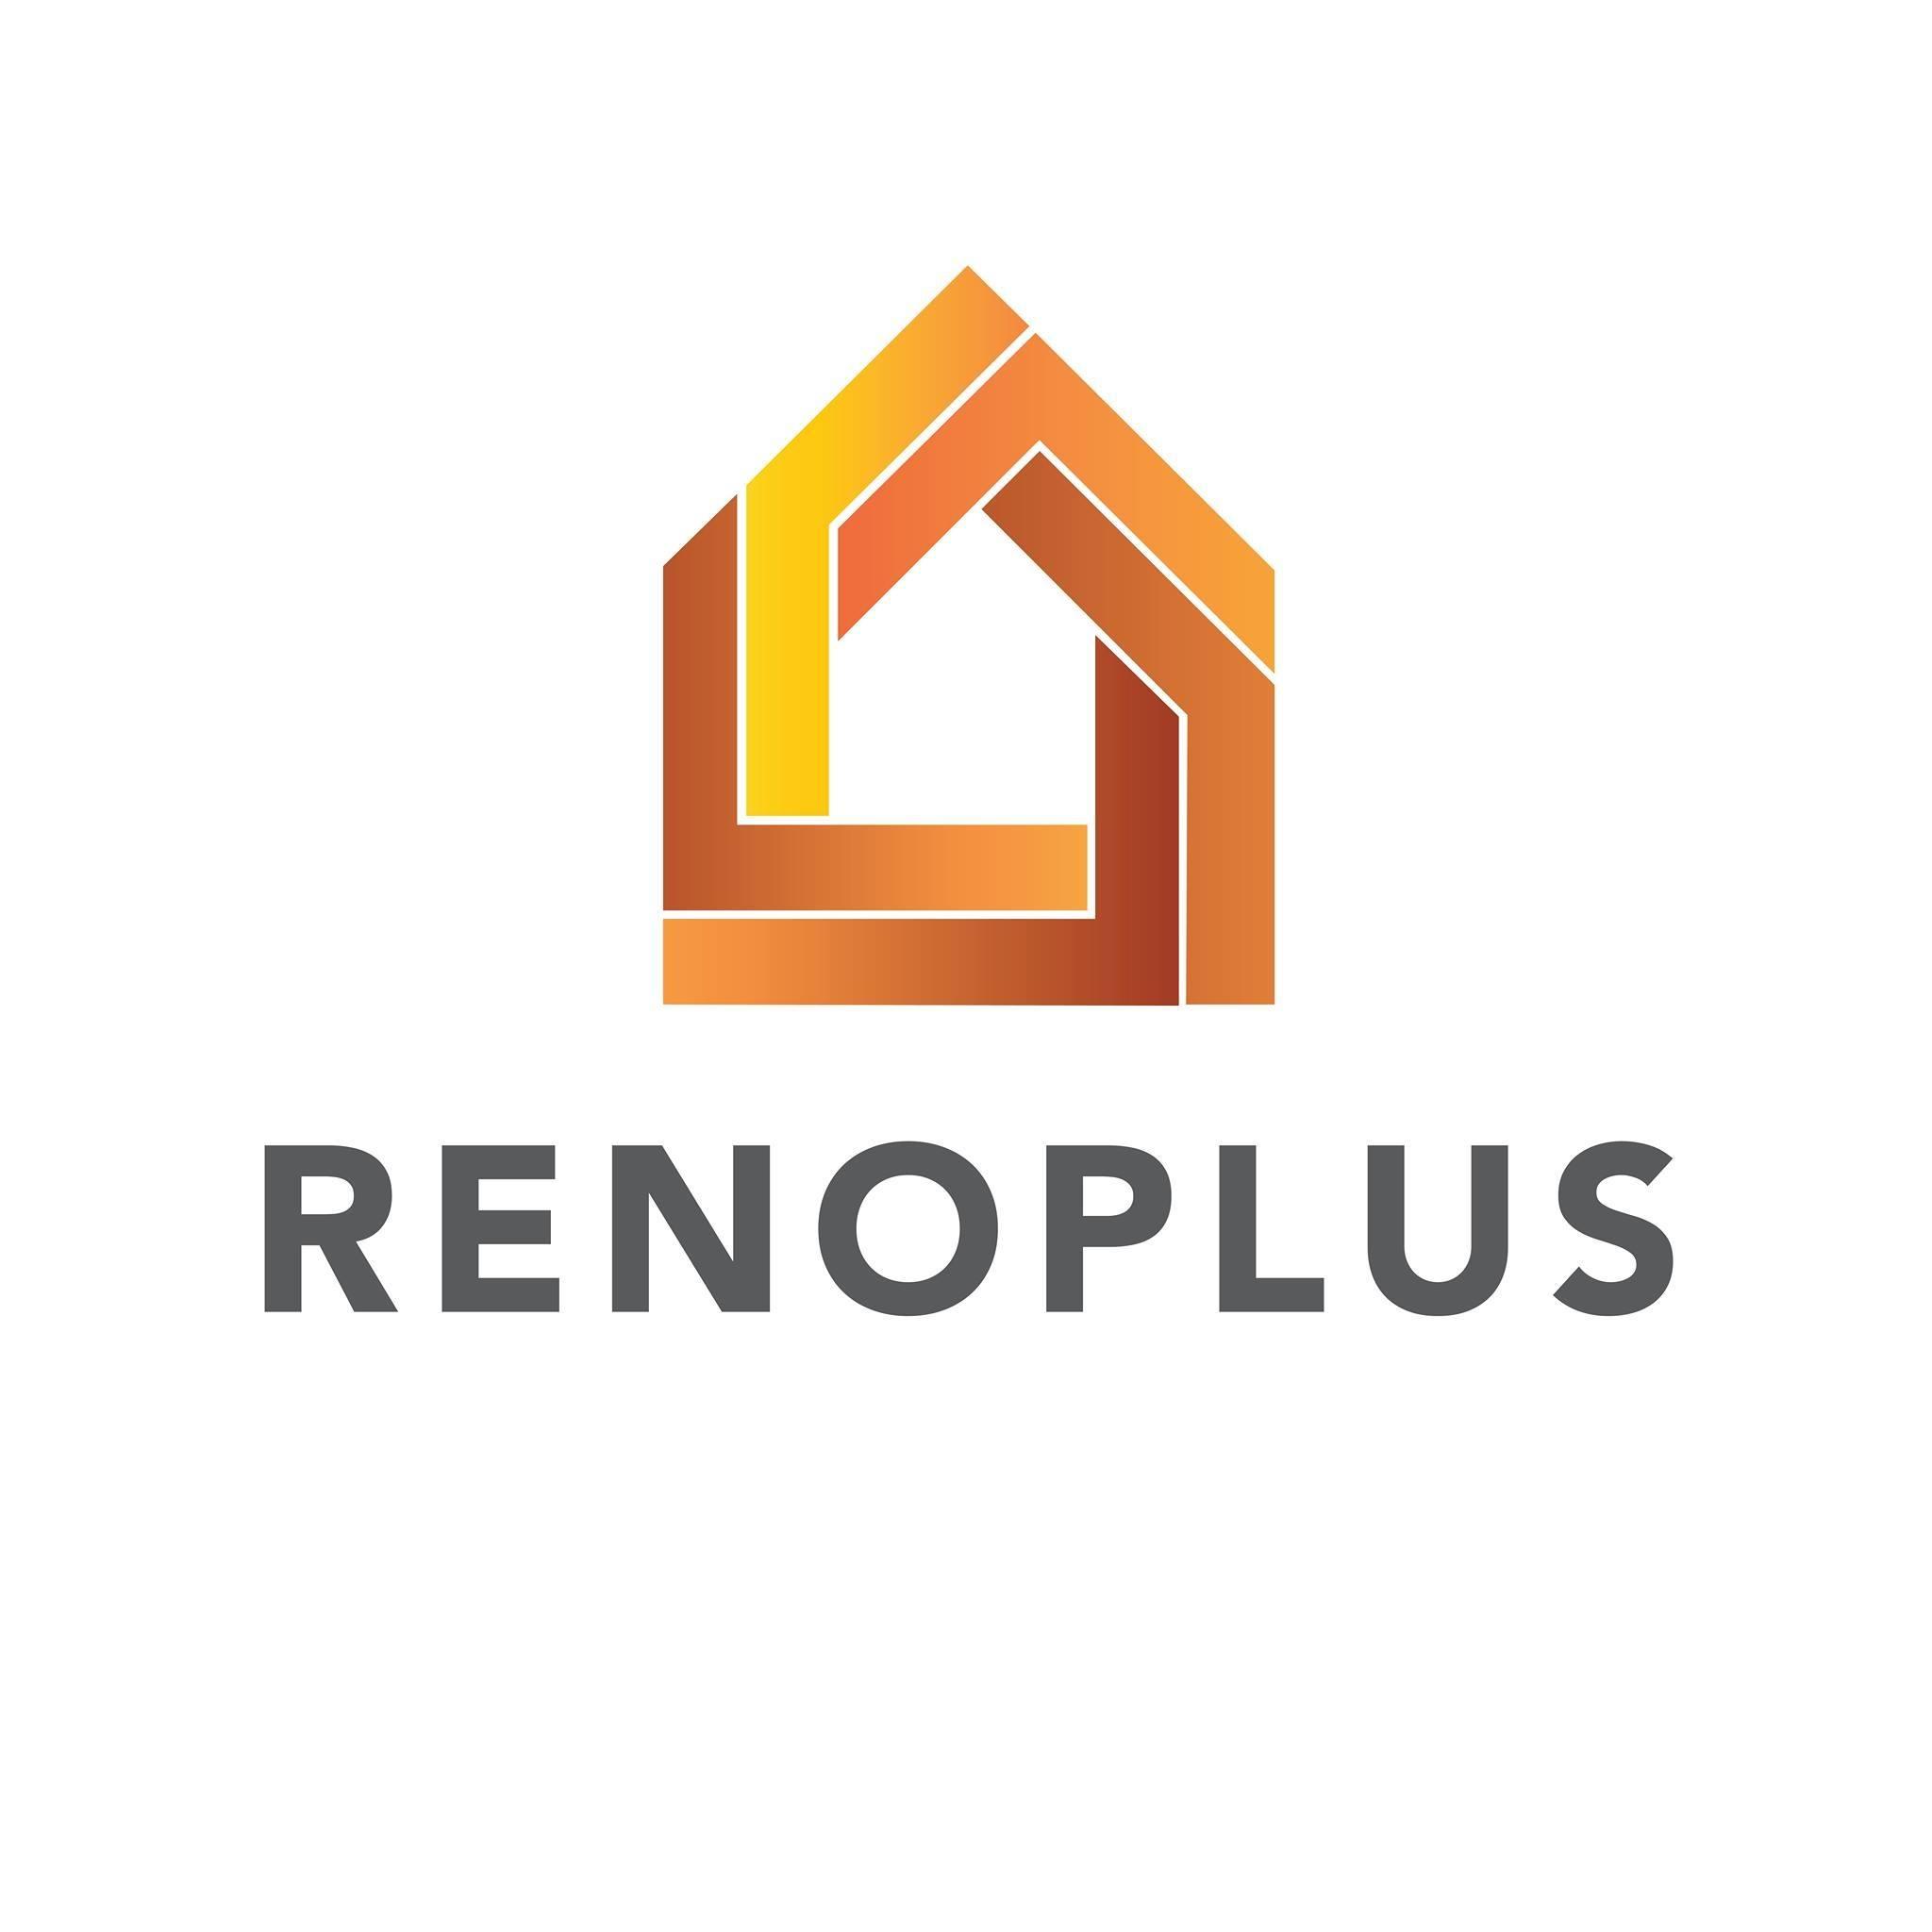 Renoplus Customer Services